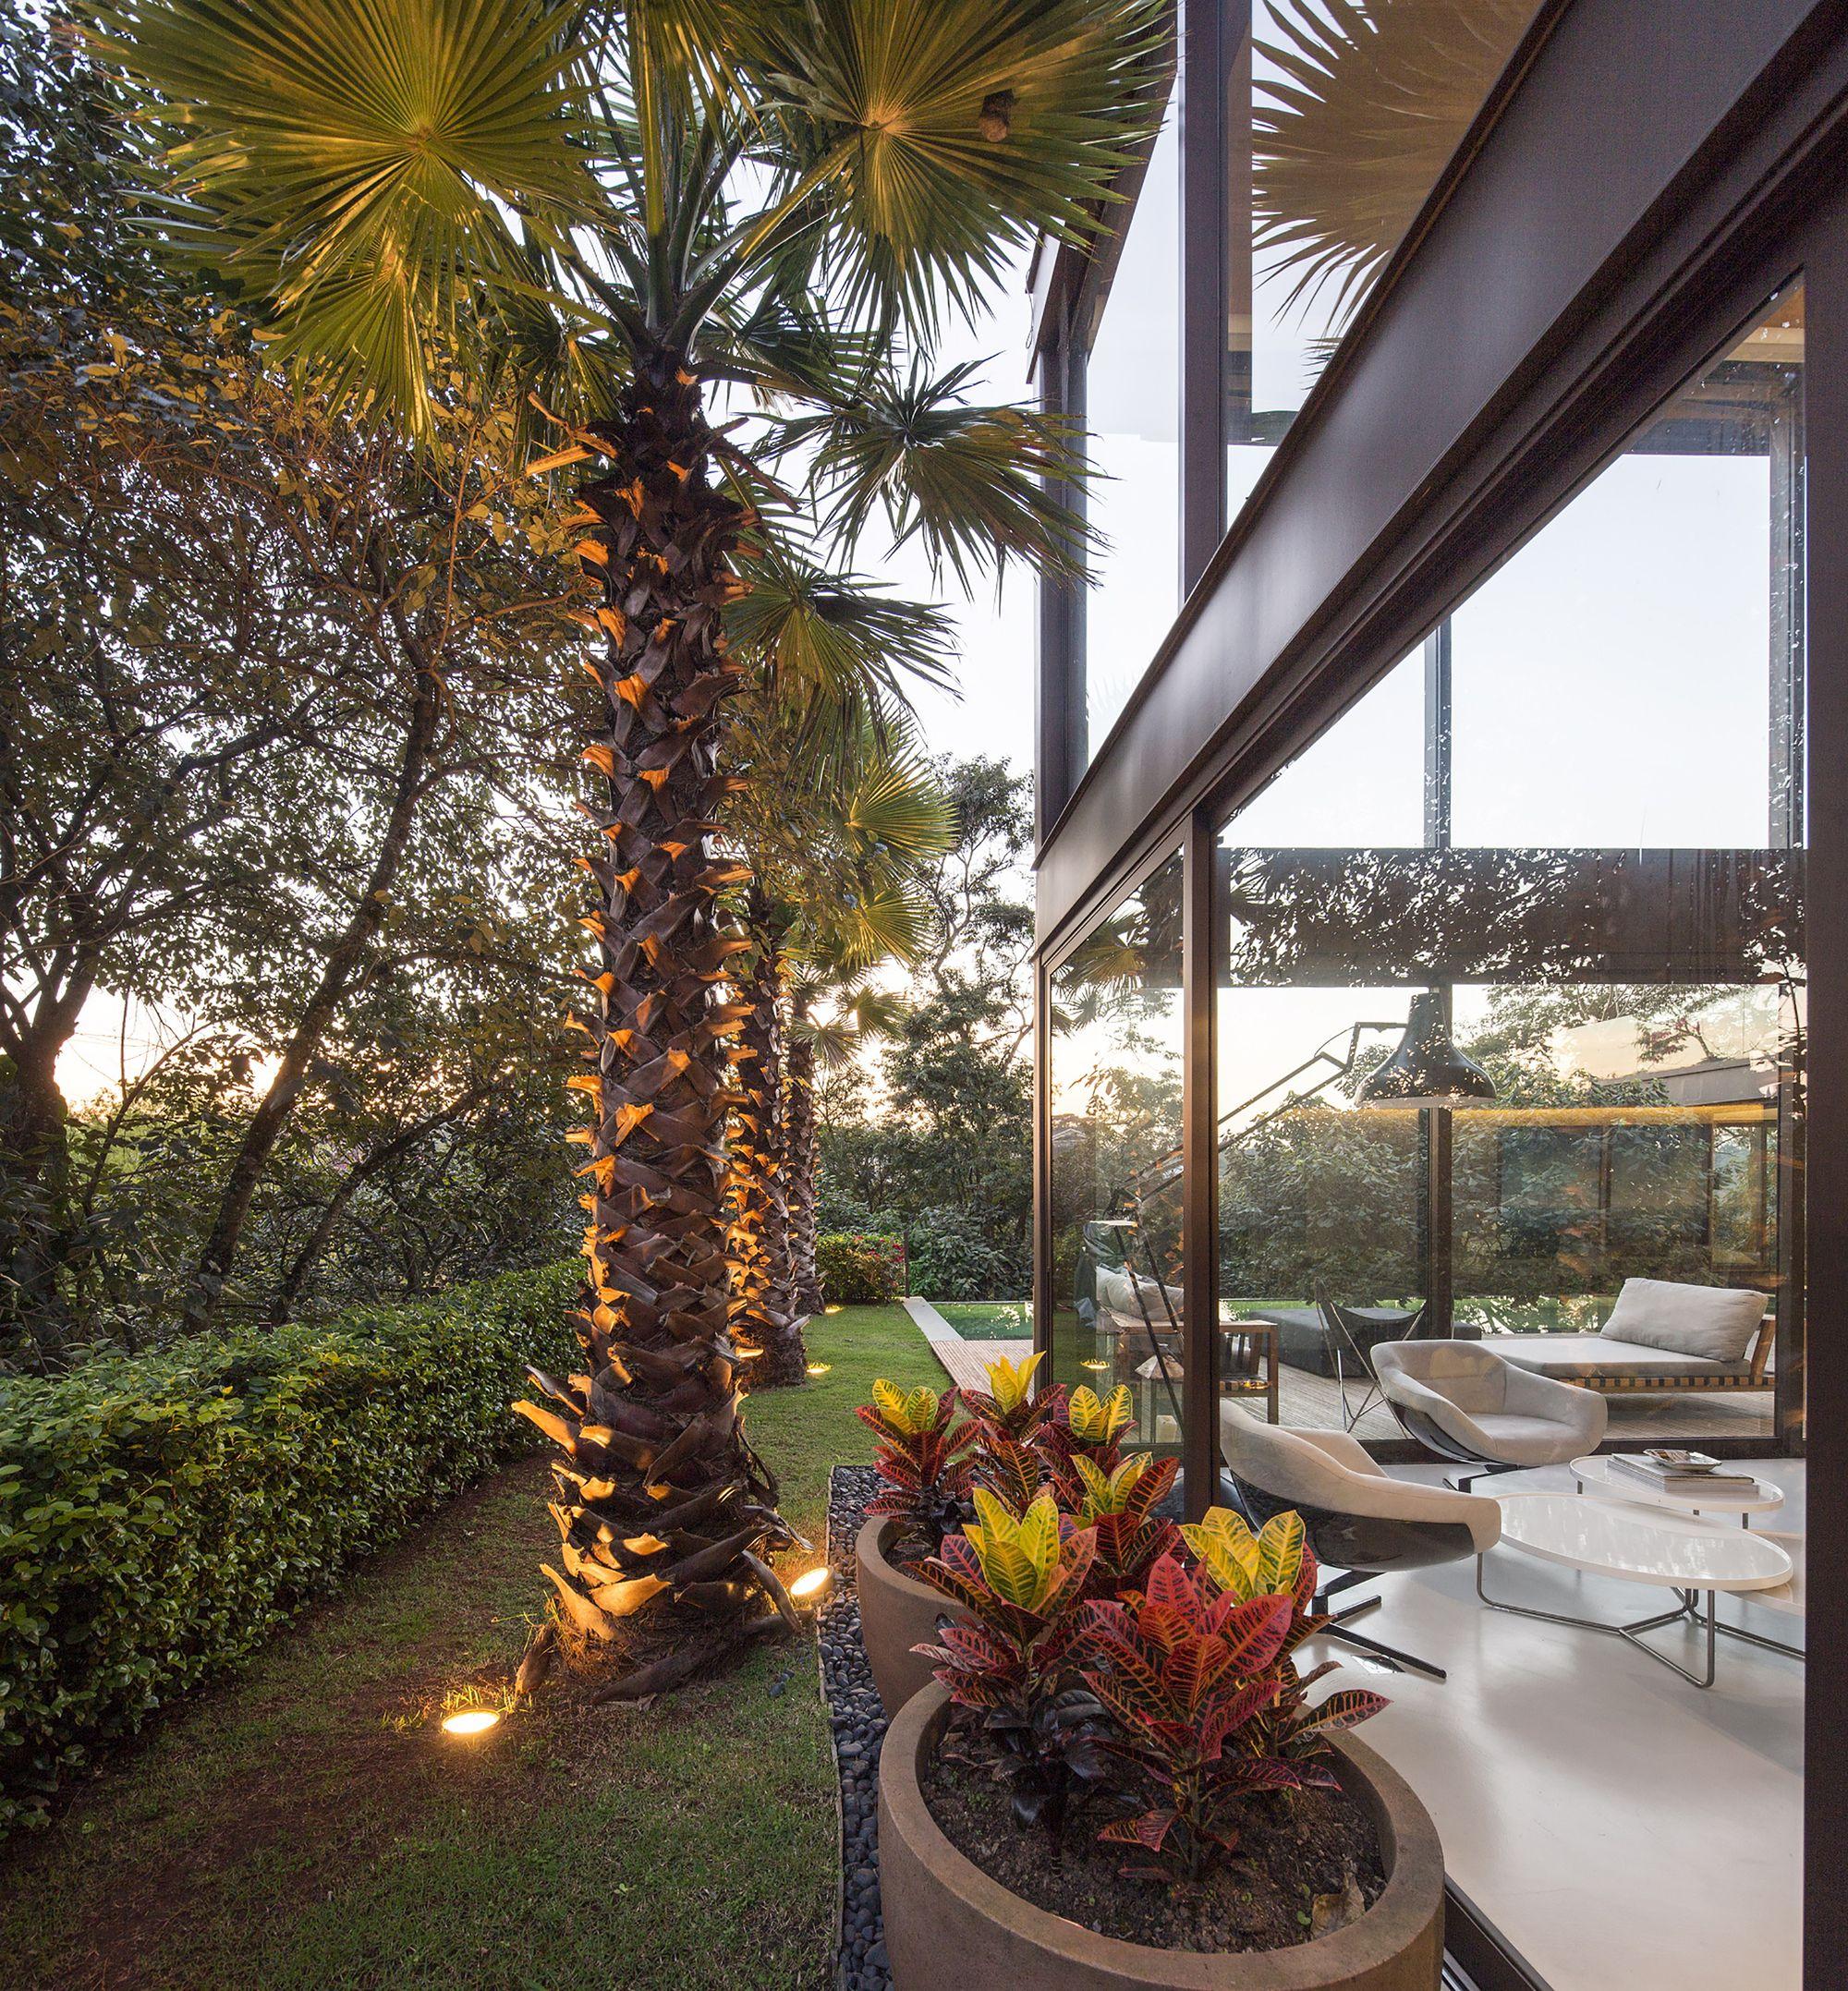 Residência Limantos / Fernanda Marques Arquitetos Associados @fmaa @fgsg #living #outdoor #landscape #yard #backyard #green #nature #lighting